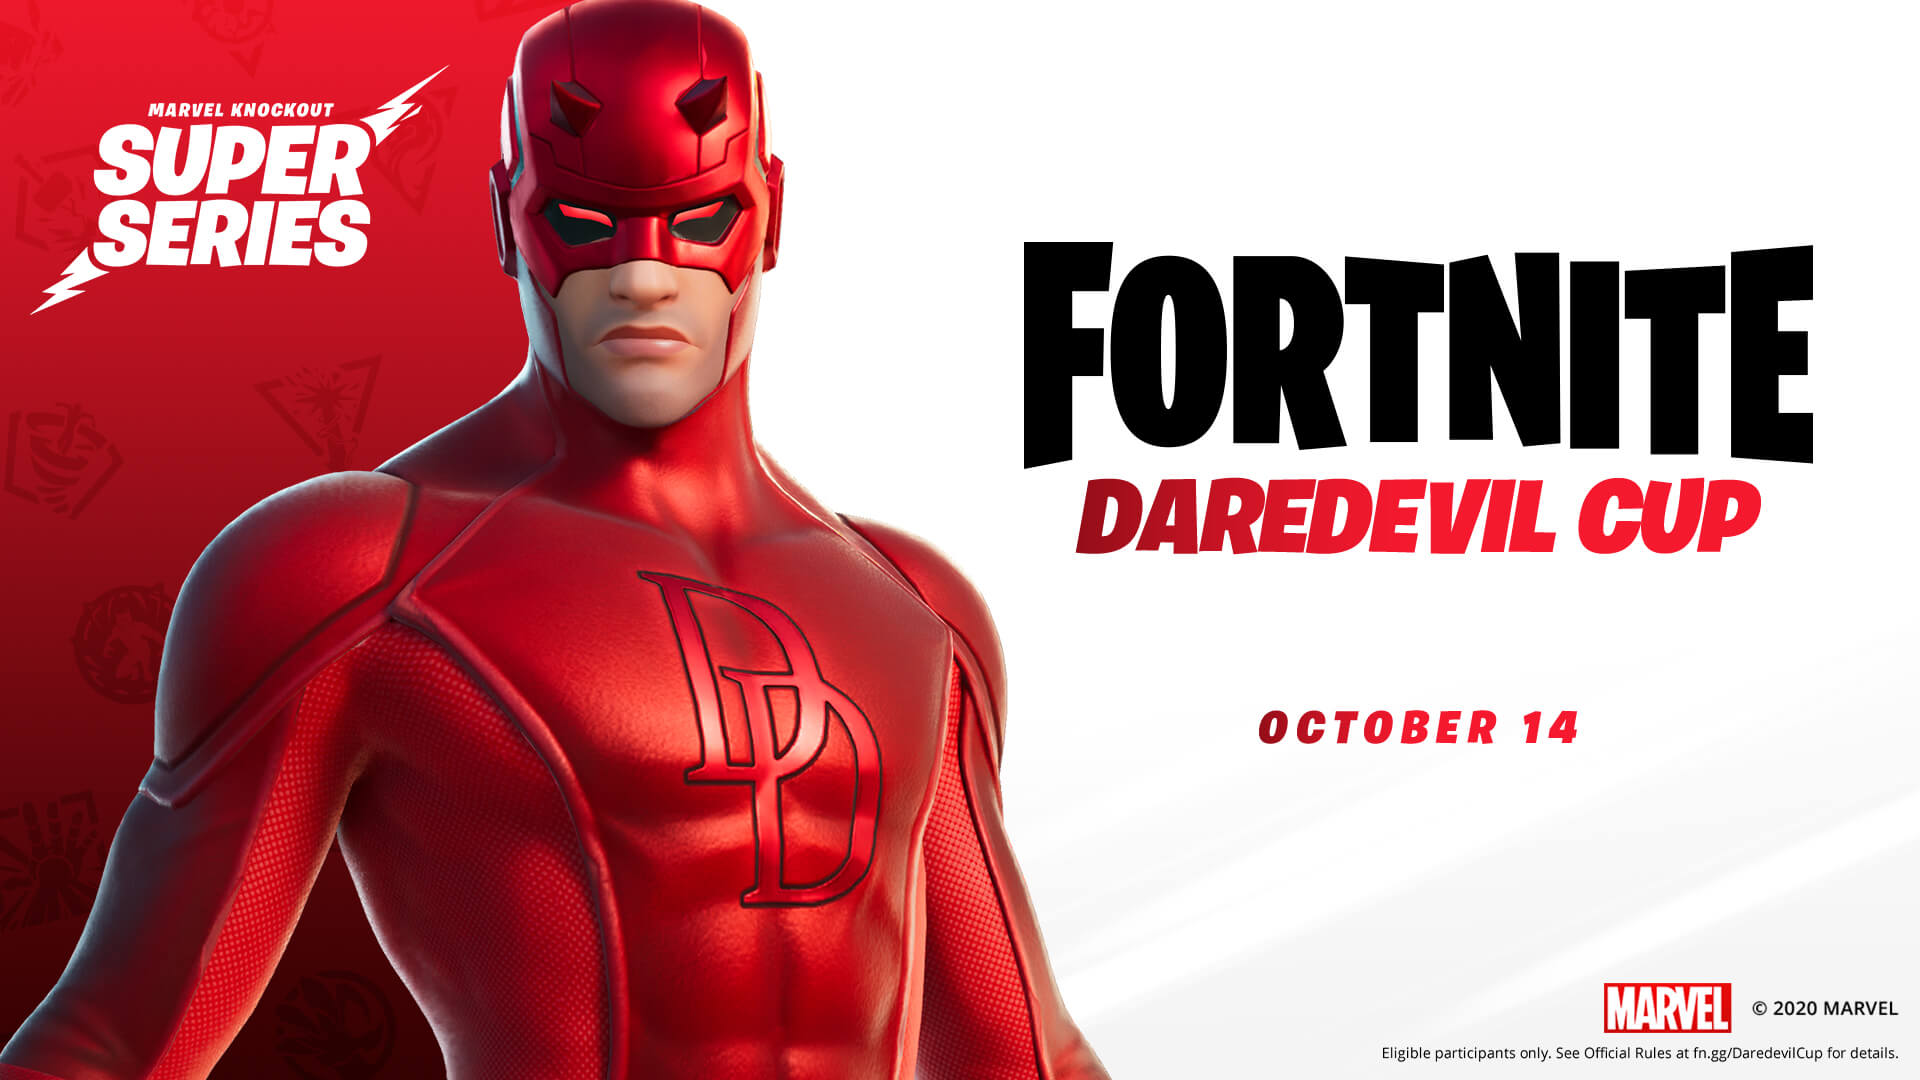 EN 14BR Competitive 1P MarvelSuperSeries DaredevilCup 1920x1080